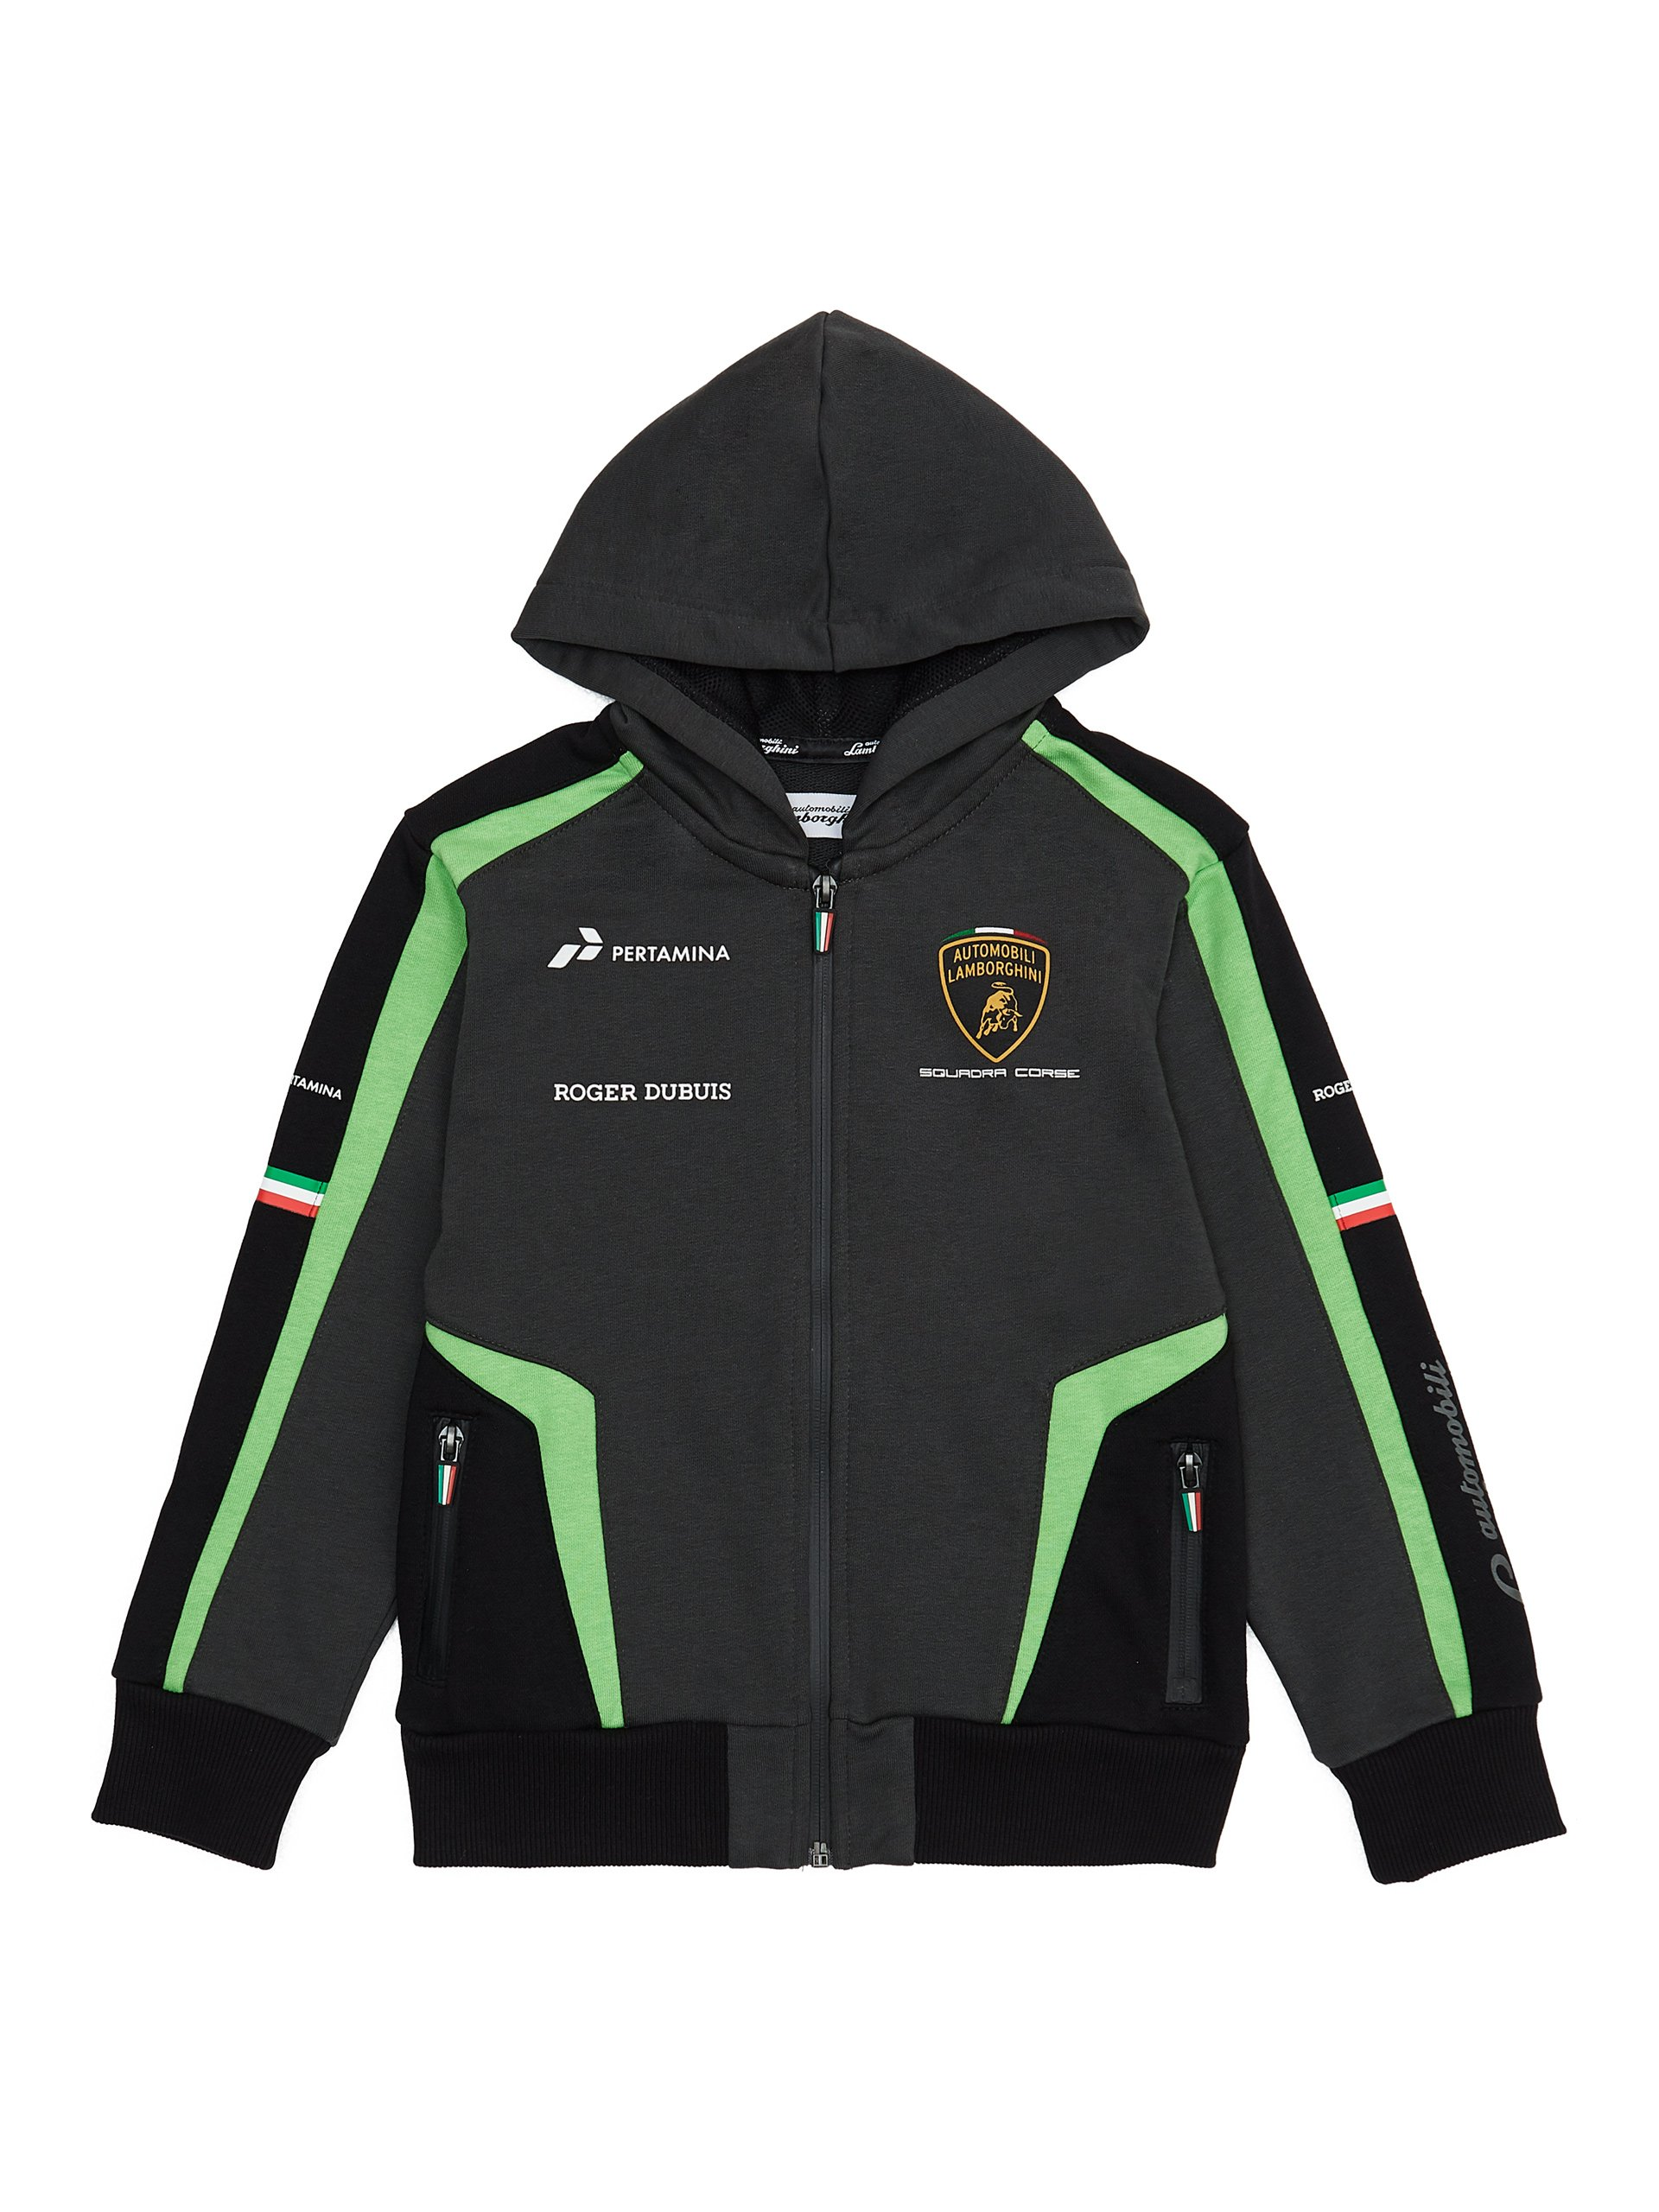 Automobili Lamborghini Children Squadra-Corse Lamborghini Kids Hooded Sweatshirt 5-6 Years Black